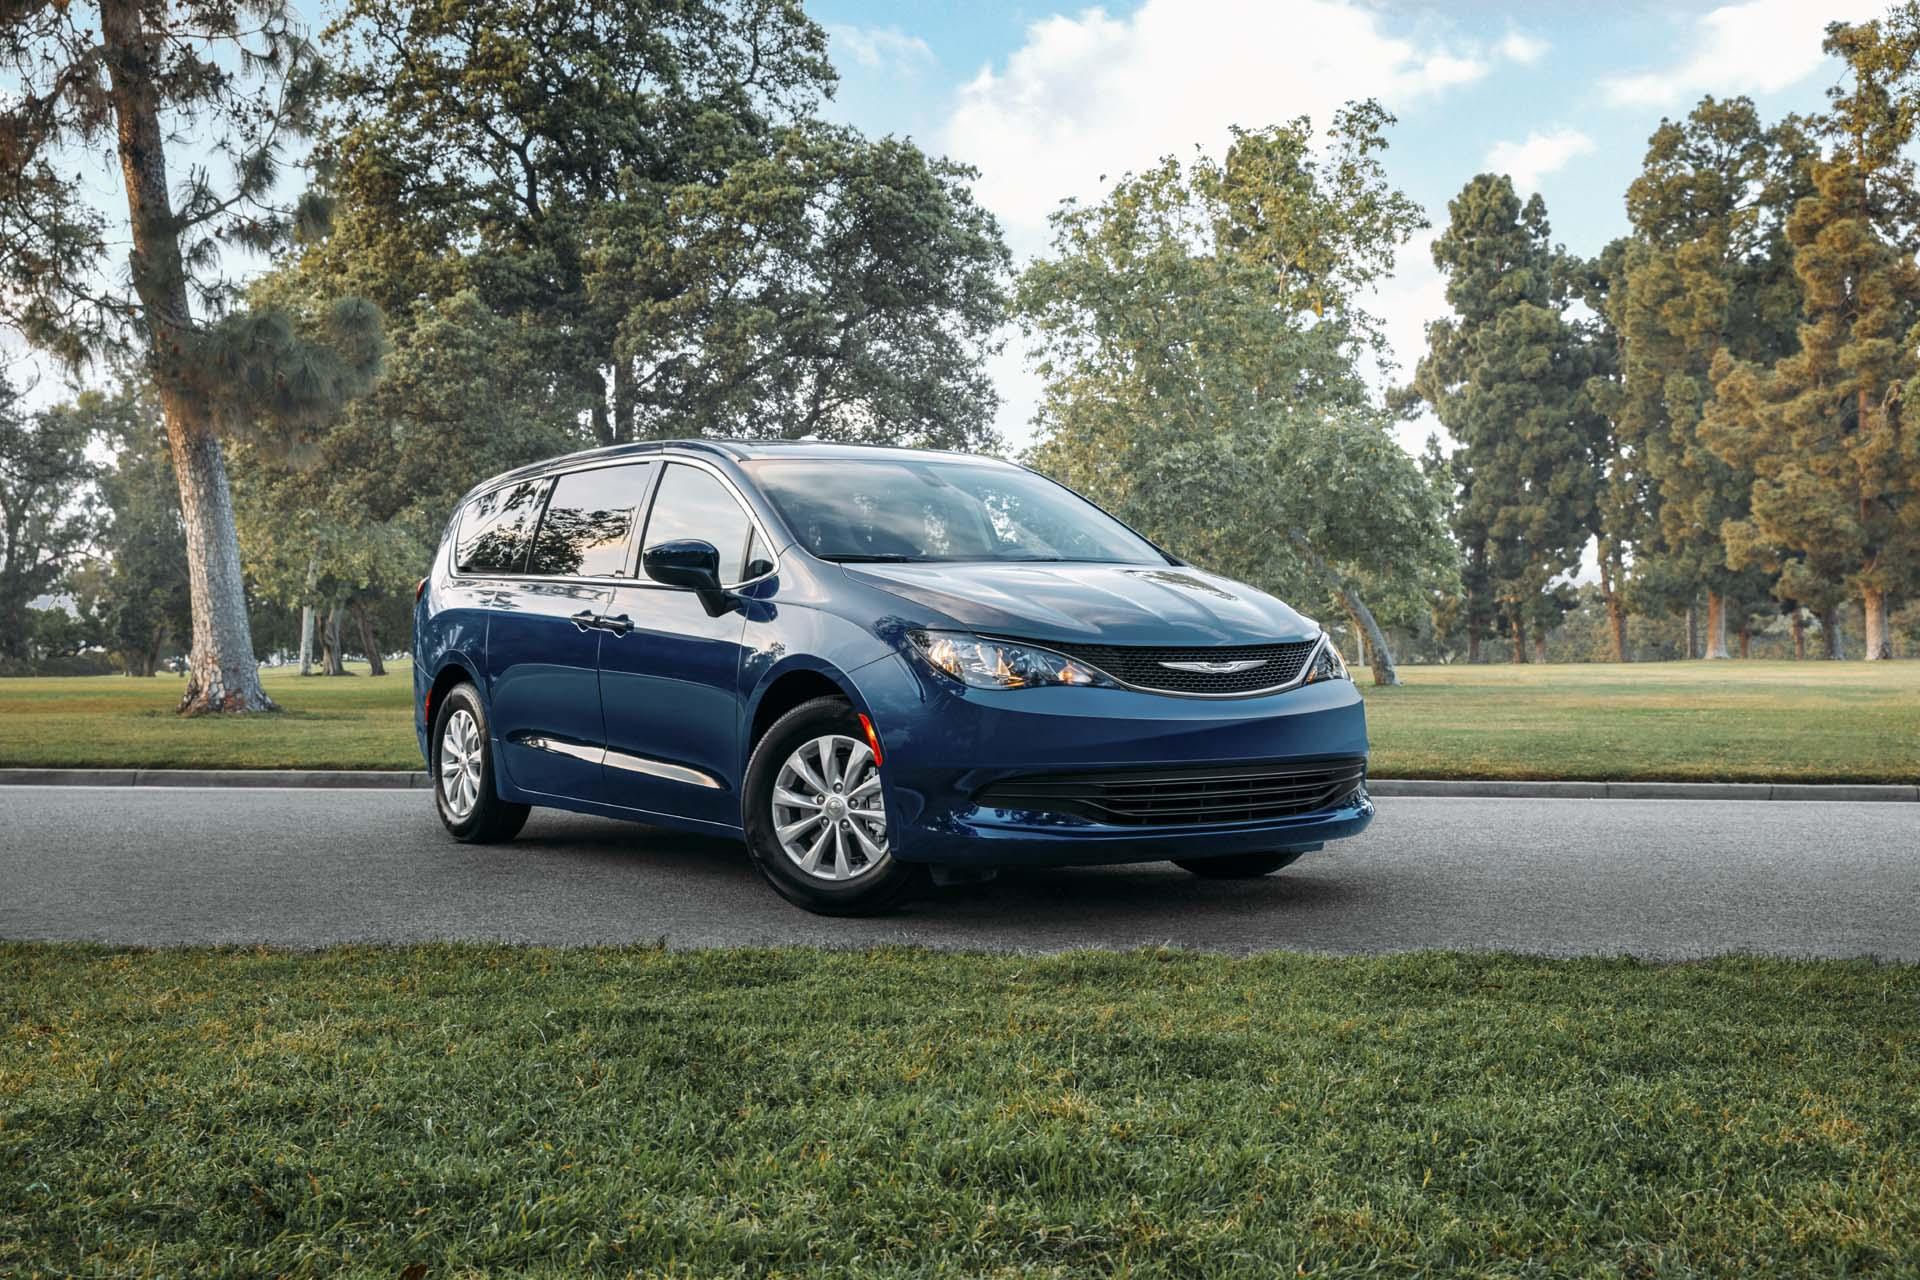 2020 Chrysler Voyager Van Will Cost 28 480